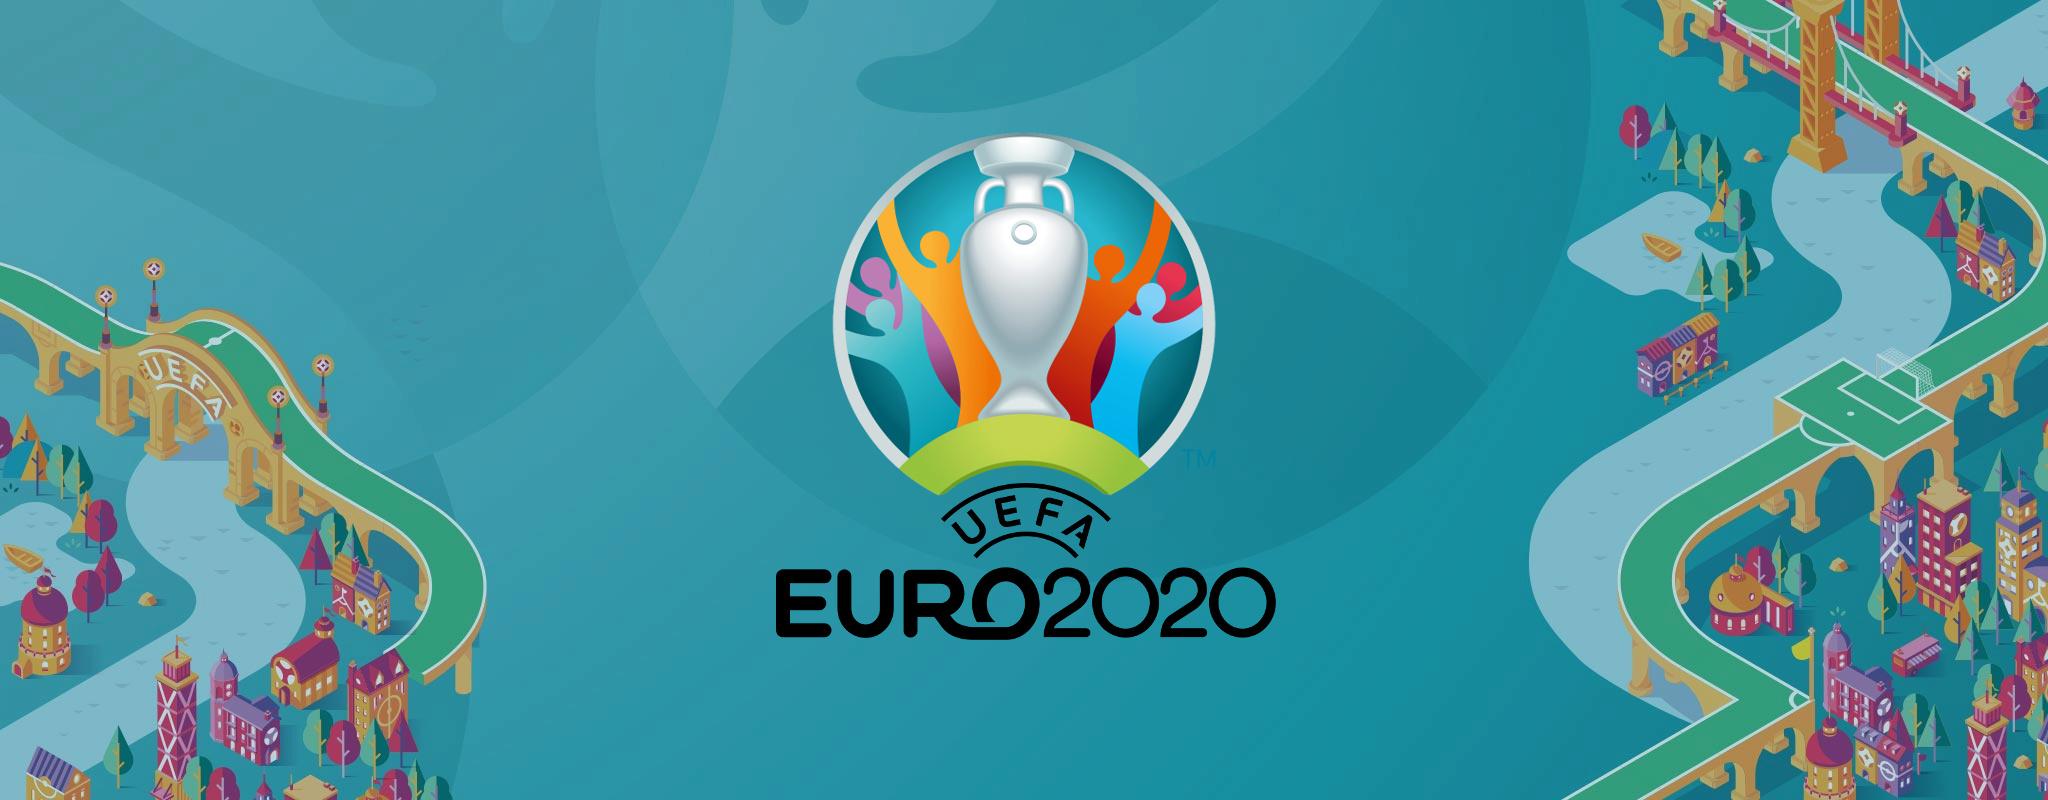 [PRONOSTICI] Qualificazioni 1°-2° Turno | UEFA Euro 2020 - Pagina 3 Immagi12